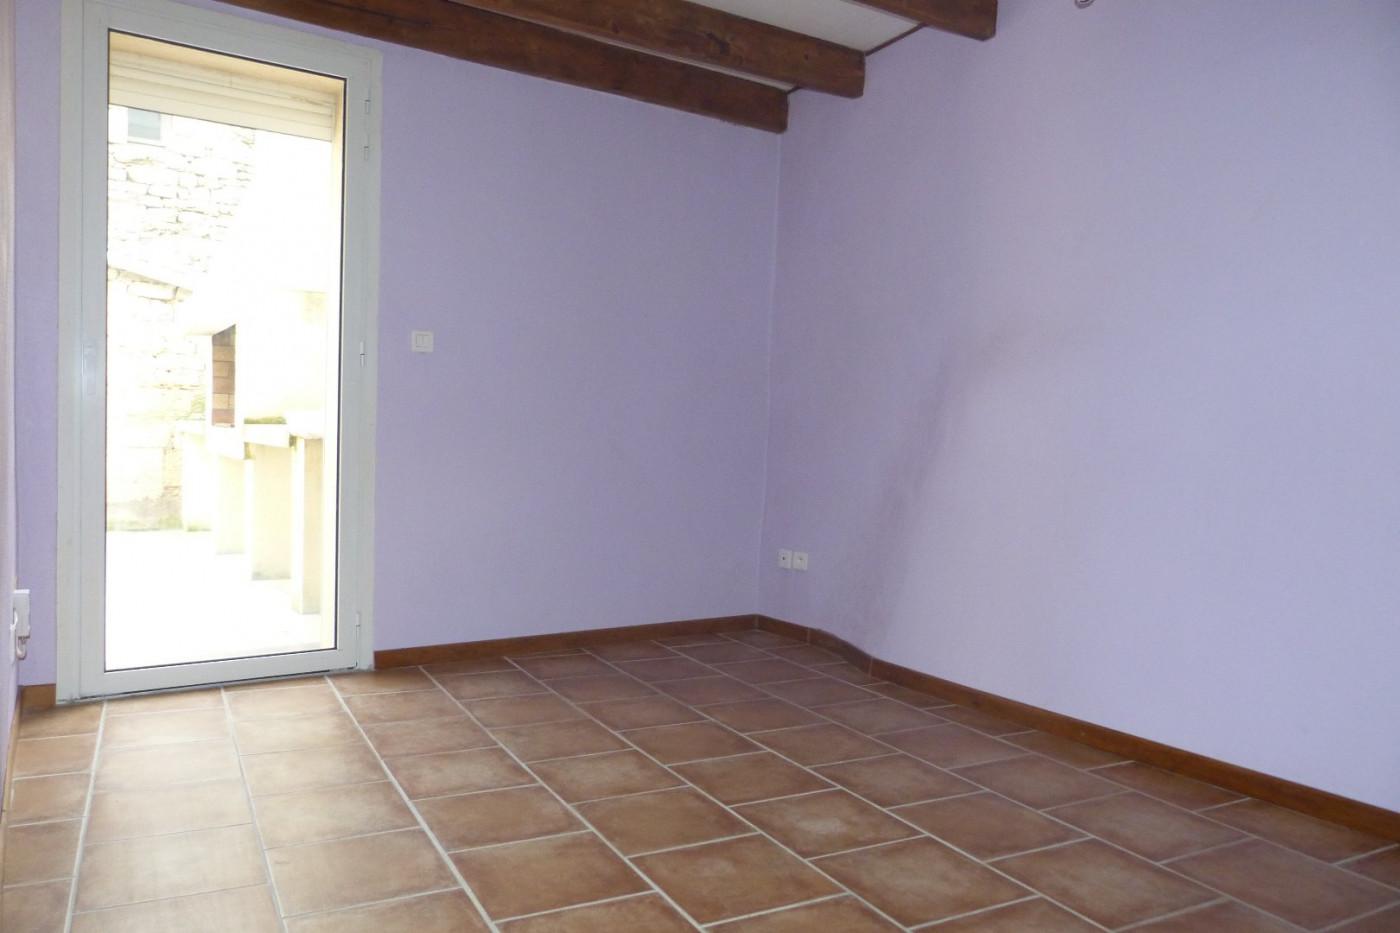 A vendre Nezignan L'eveque 34577234 David immobilier